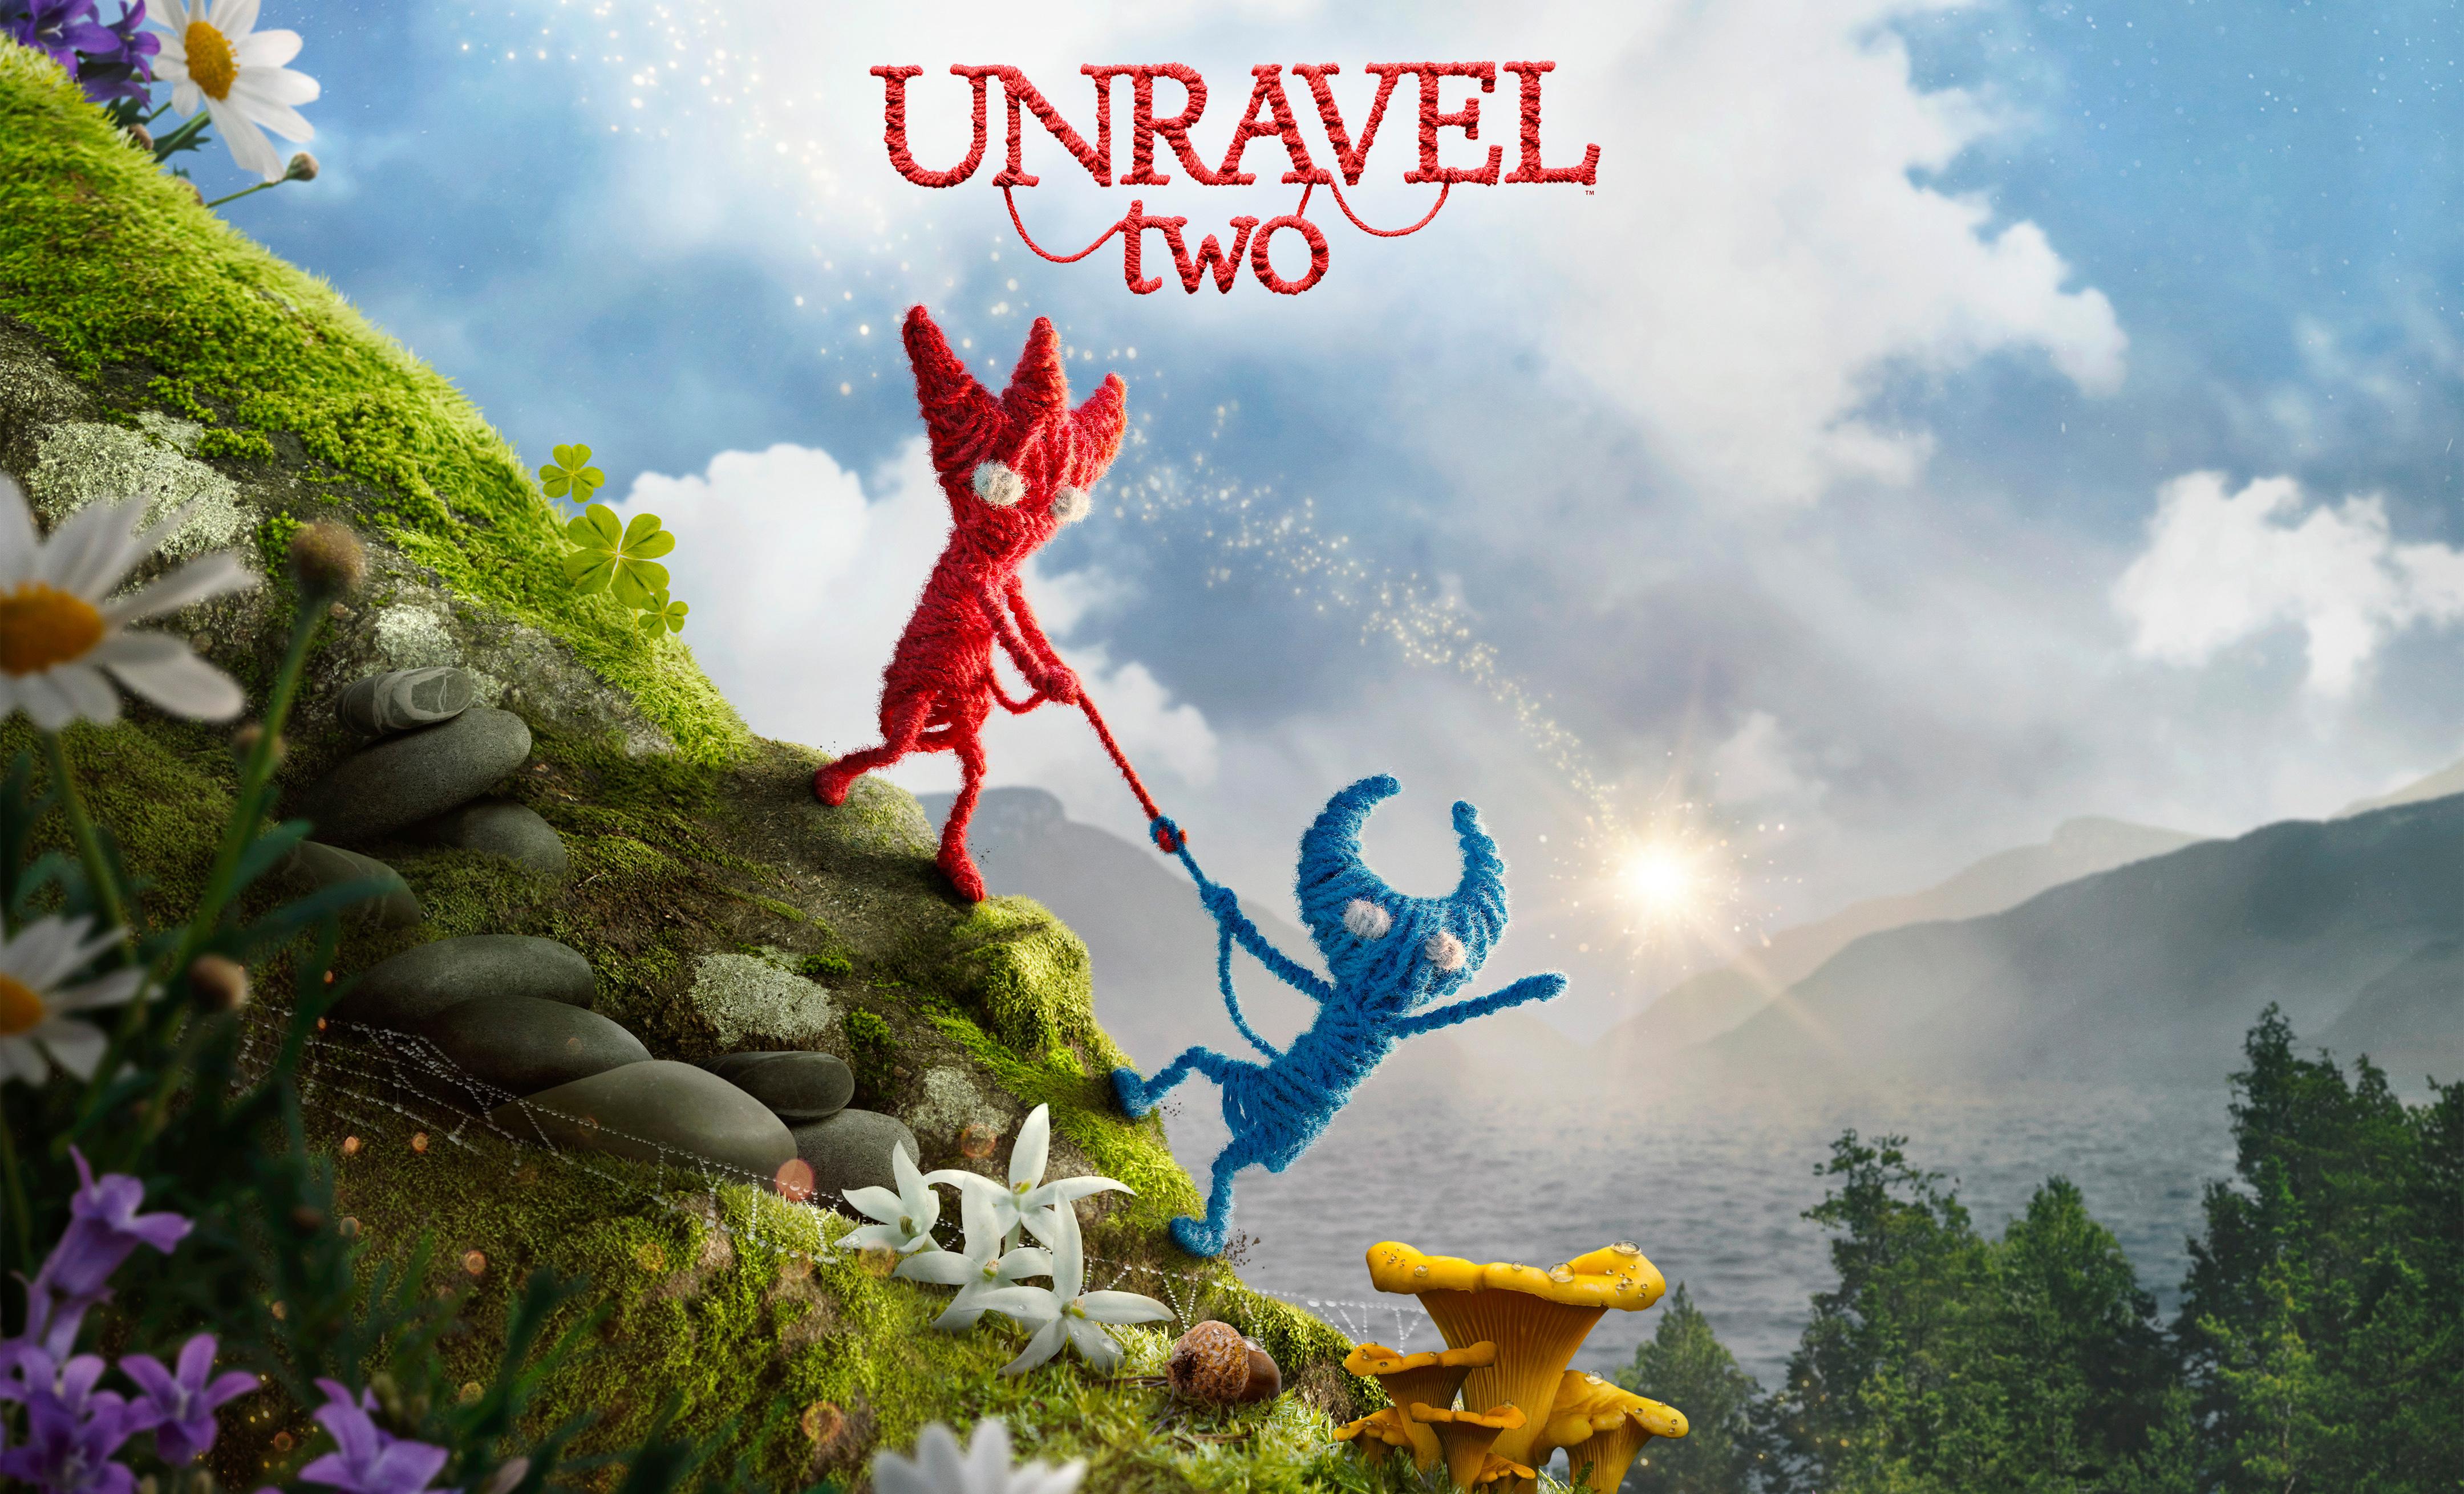 unravel 2 4320x2620 e3 2018 platform games 4k 14401